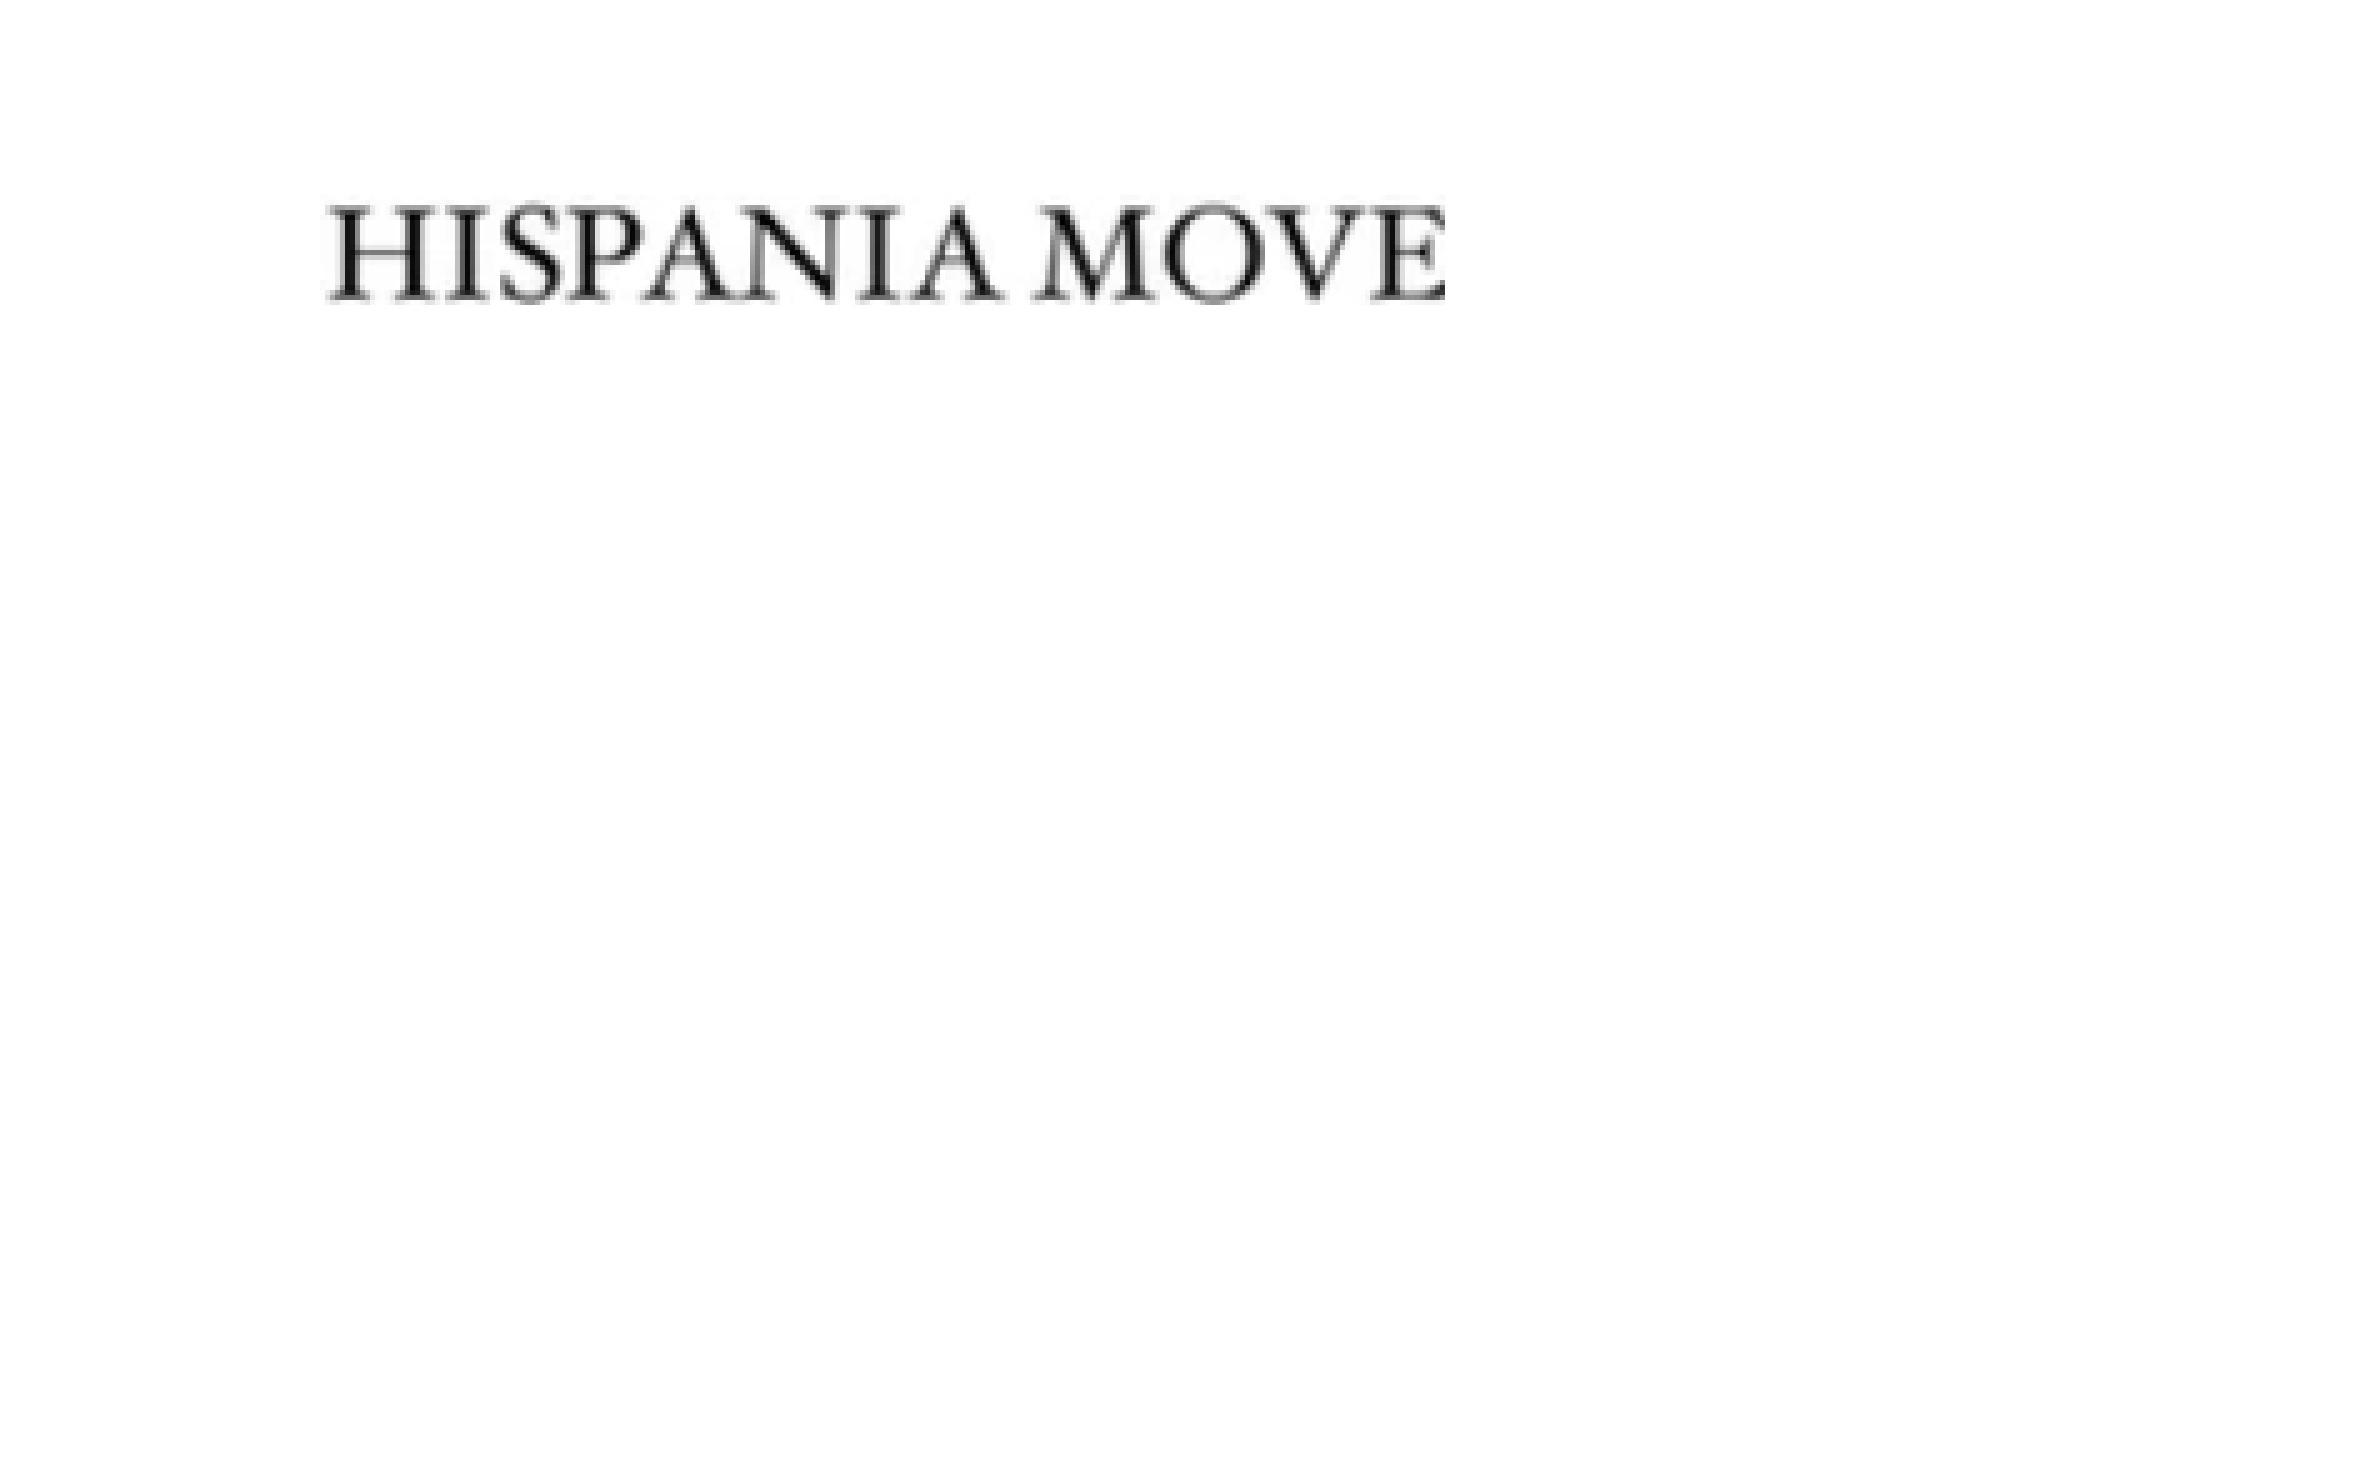 HISPANIA MOVE